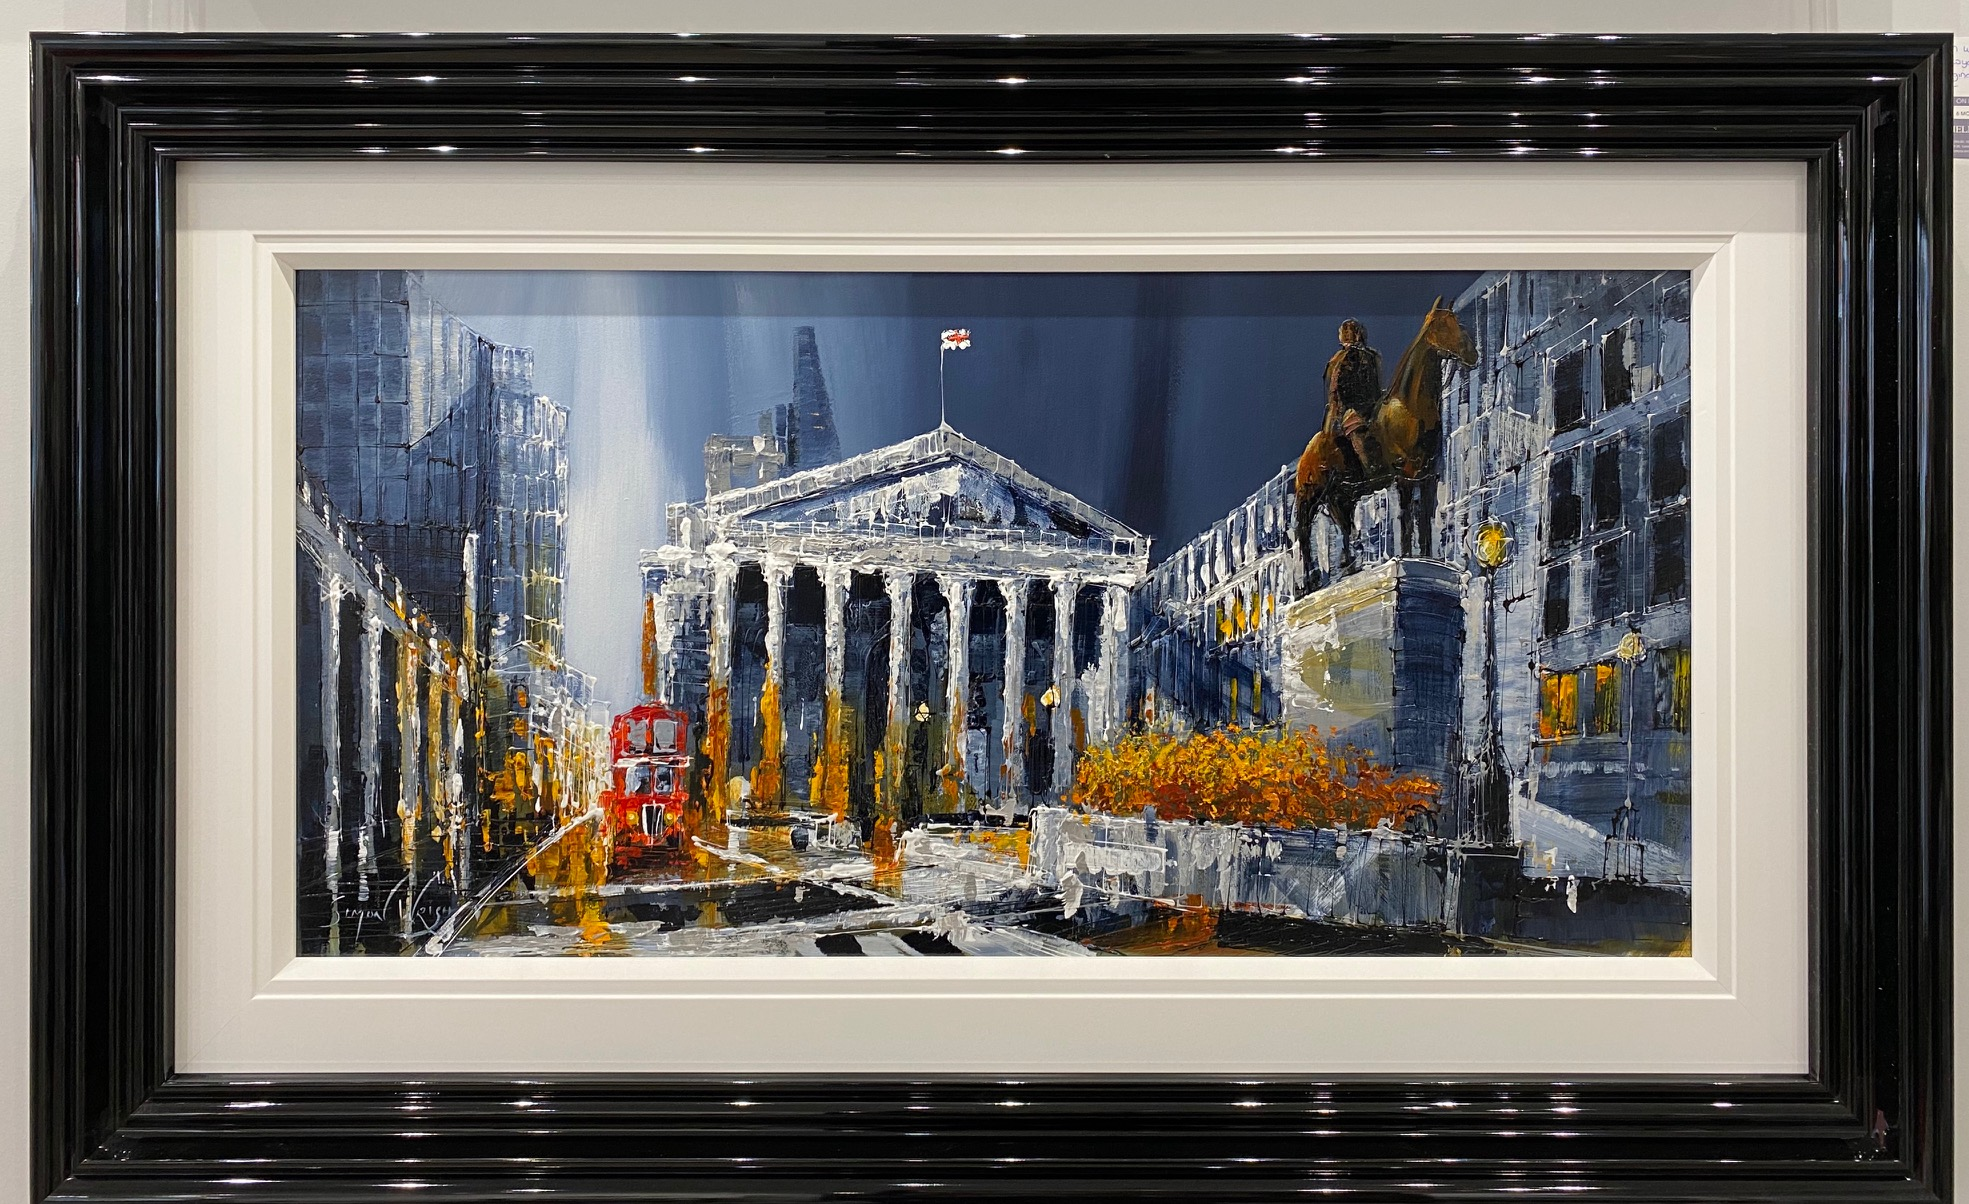 The Royal Exchange by Simon Wright